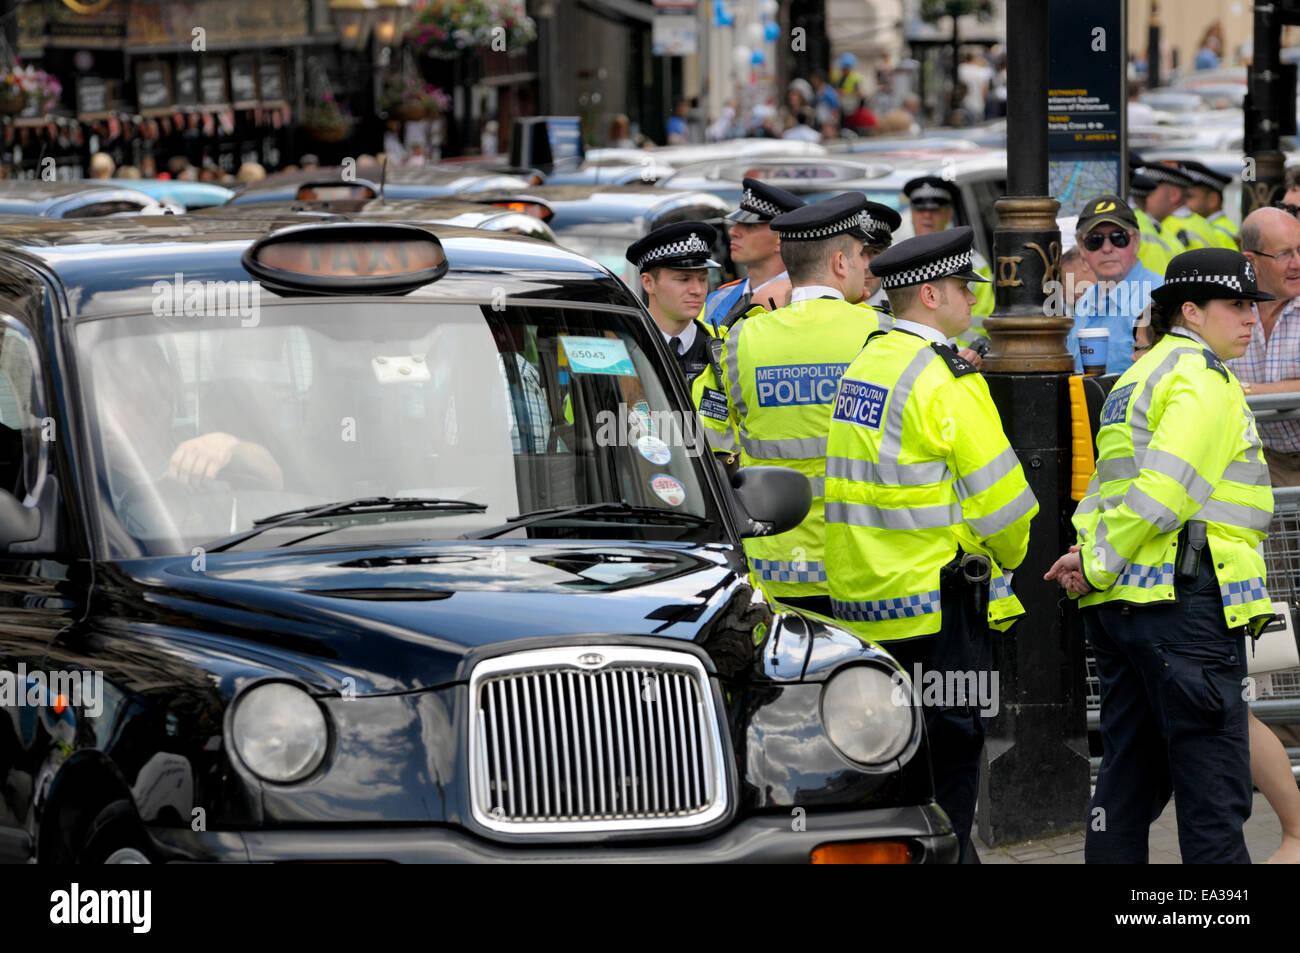 London, England, UK. Metropolitan police officers and London Black cab drivers blockading Trafalgar Square in demo - Stock Image